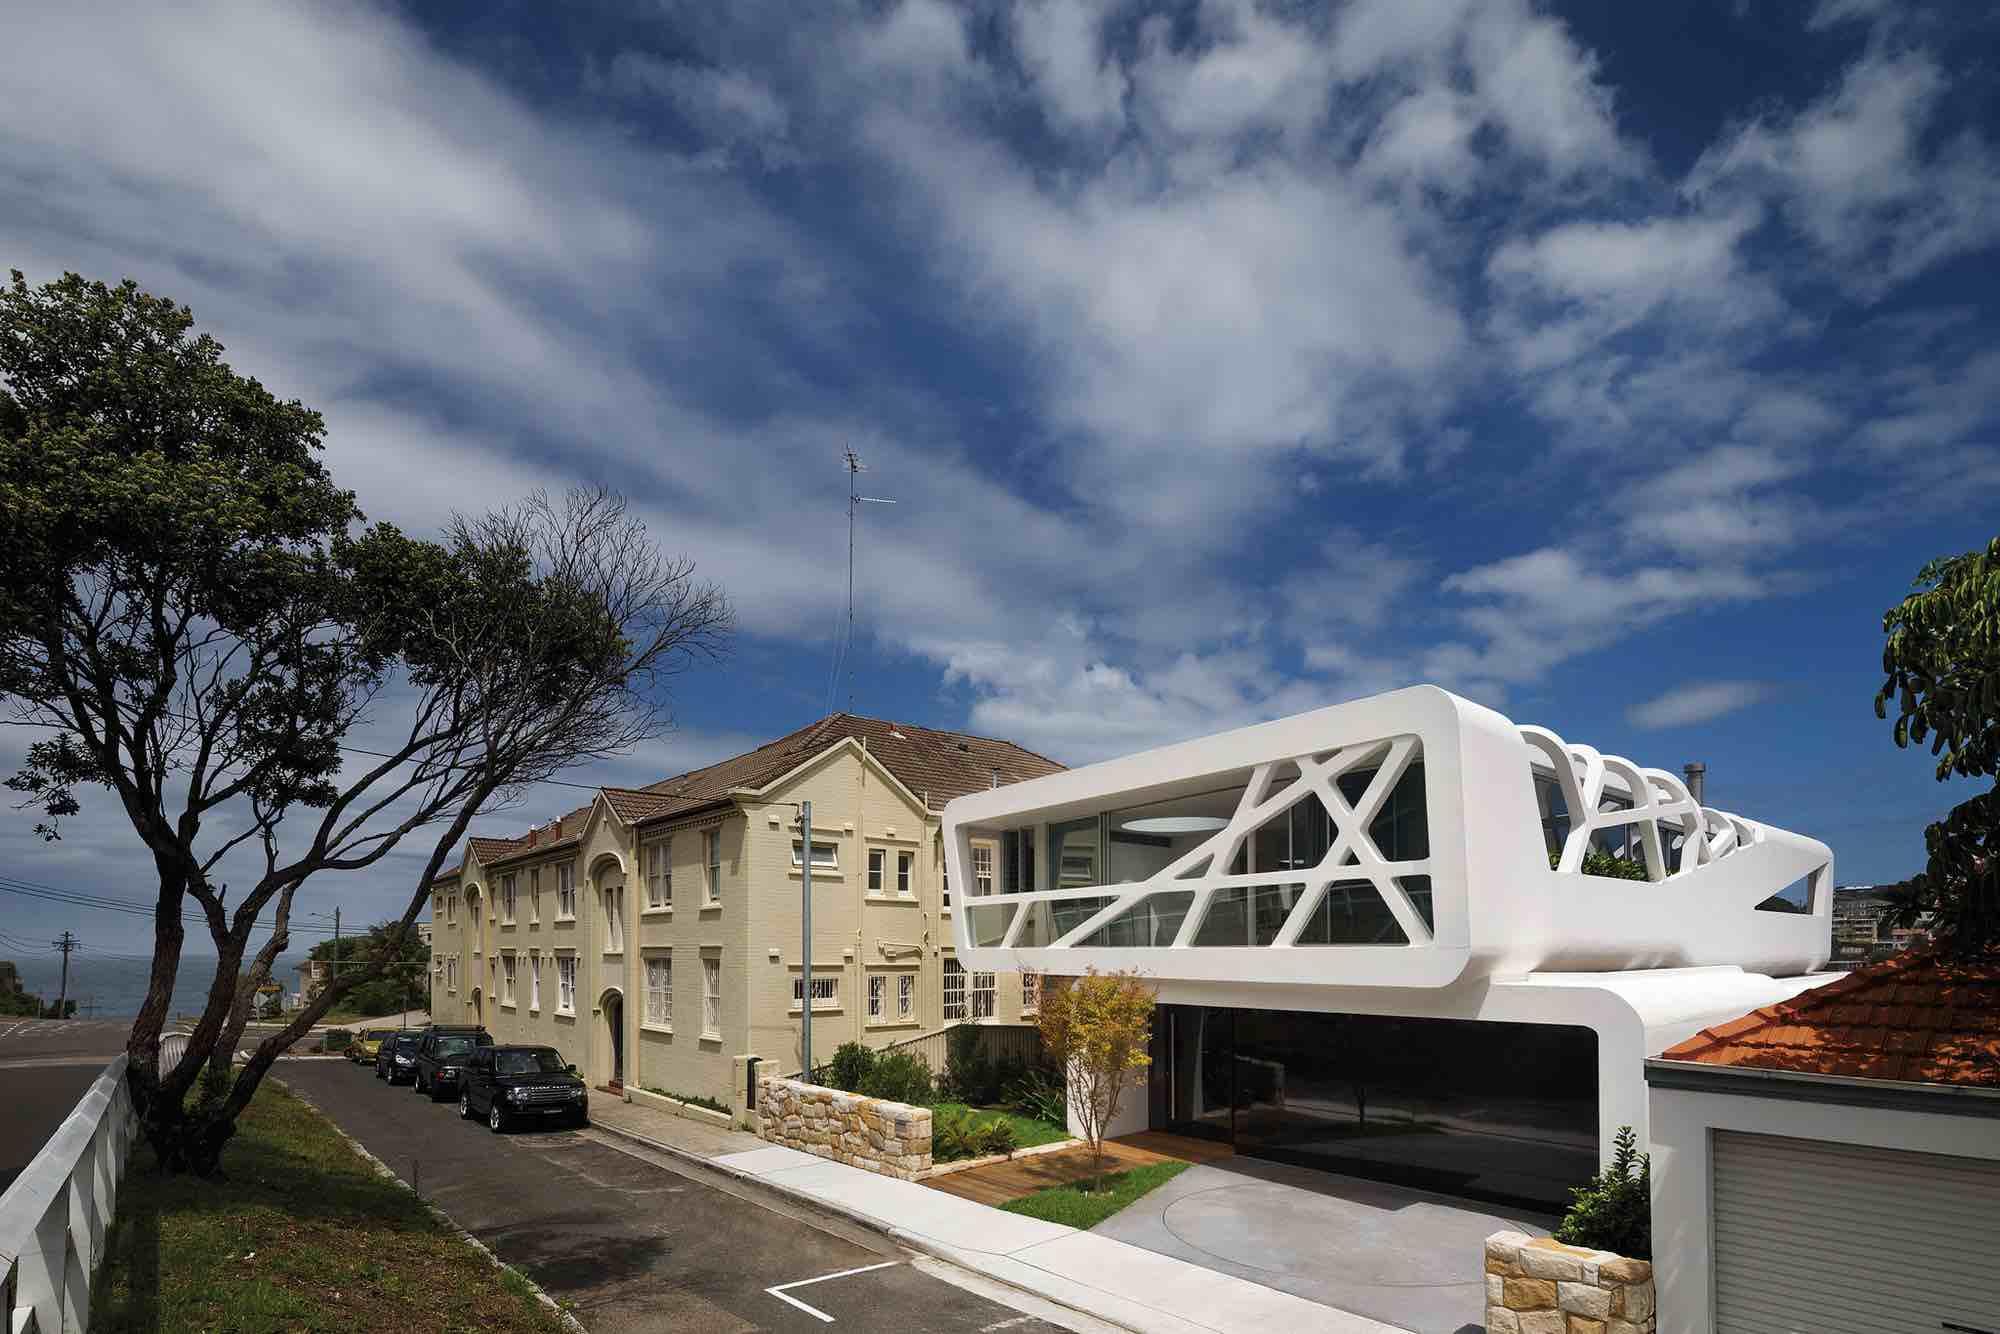 hewlett-street-house-mpr-design-group_hewlett_house03